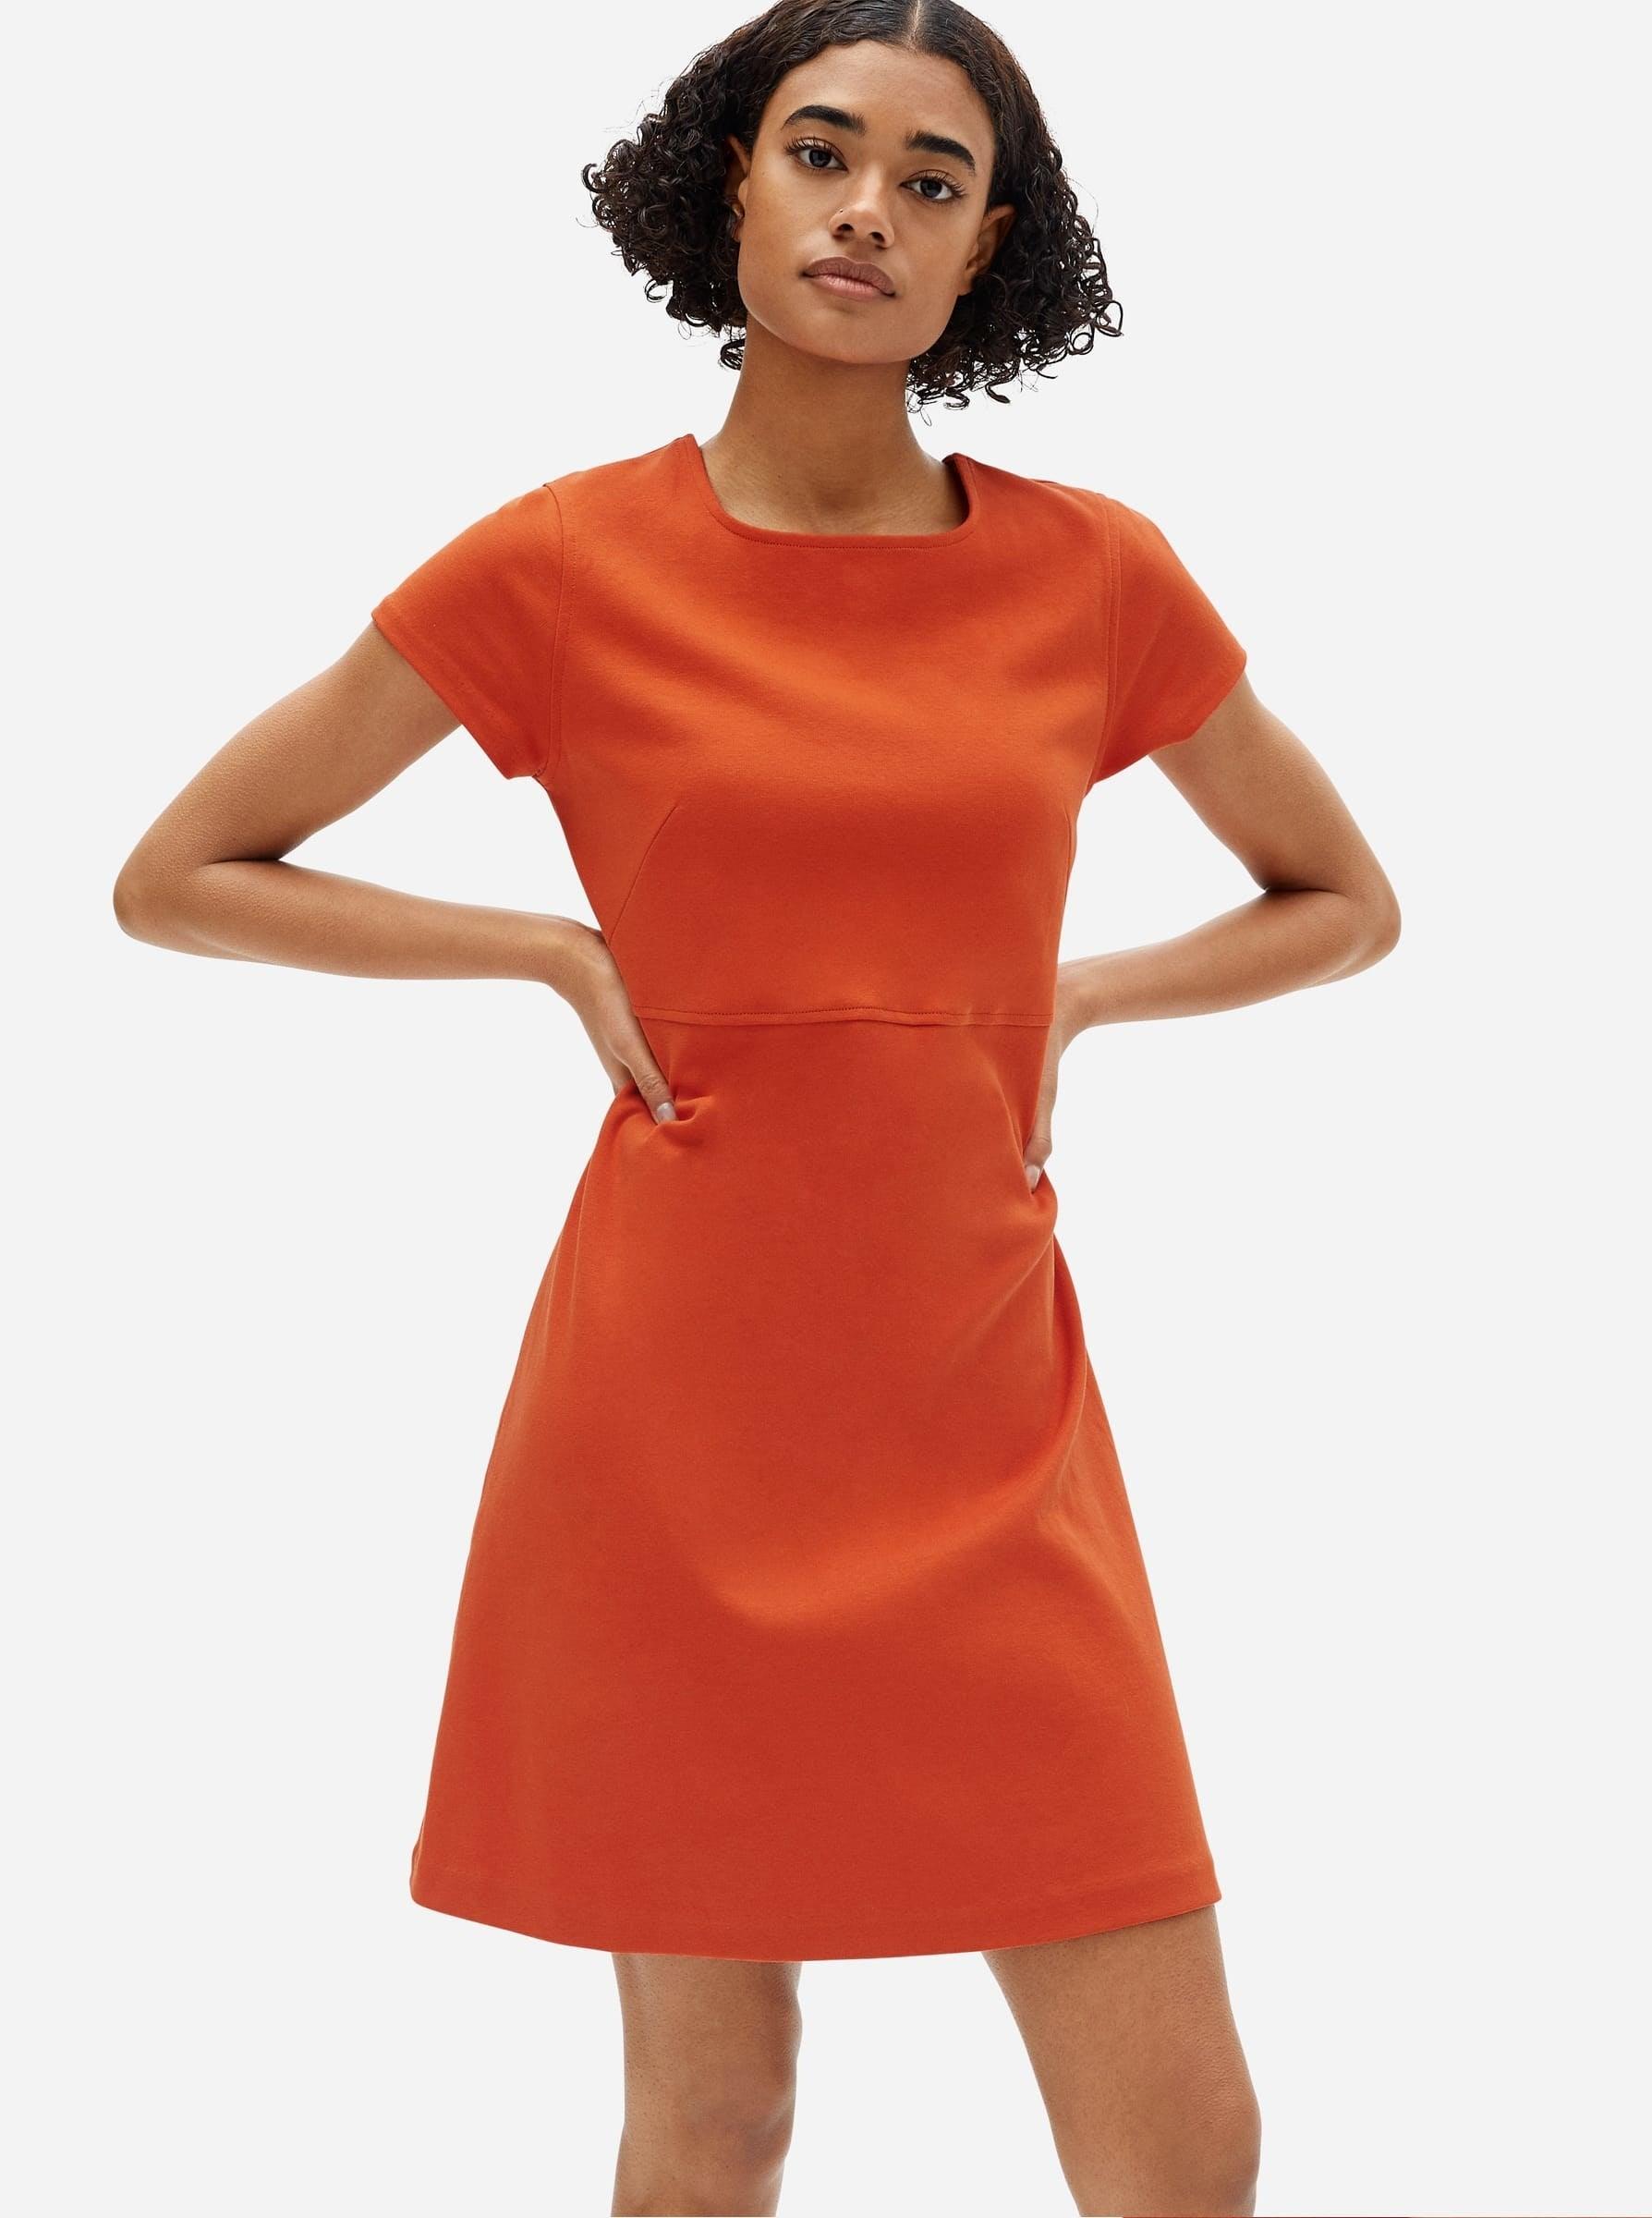 model in red short t-shirt dress